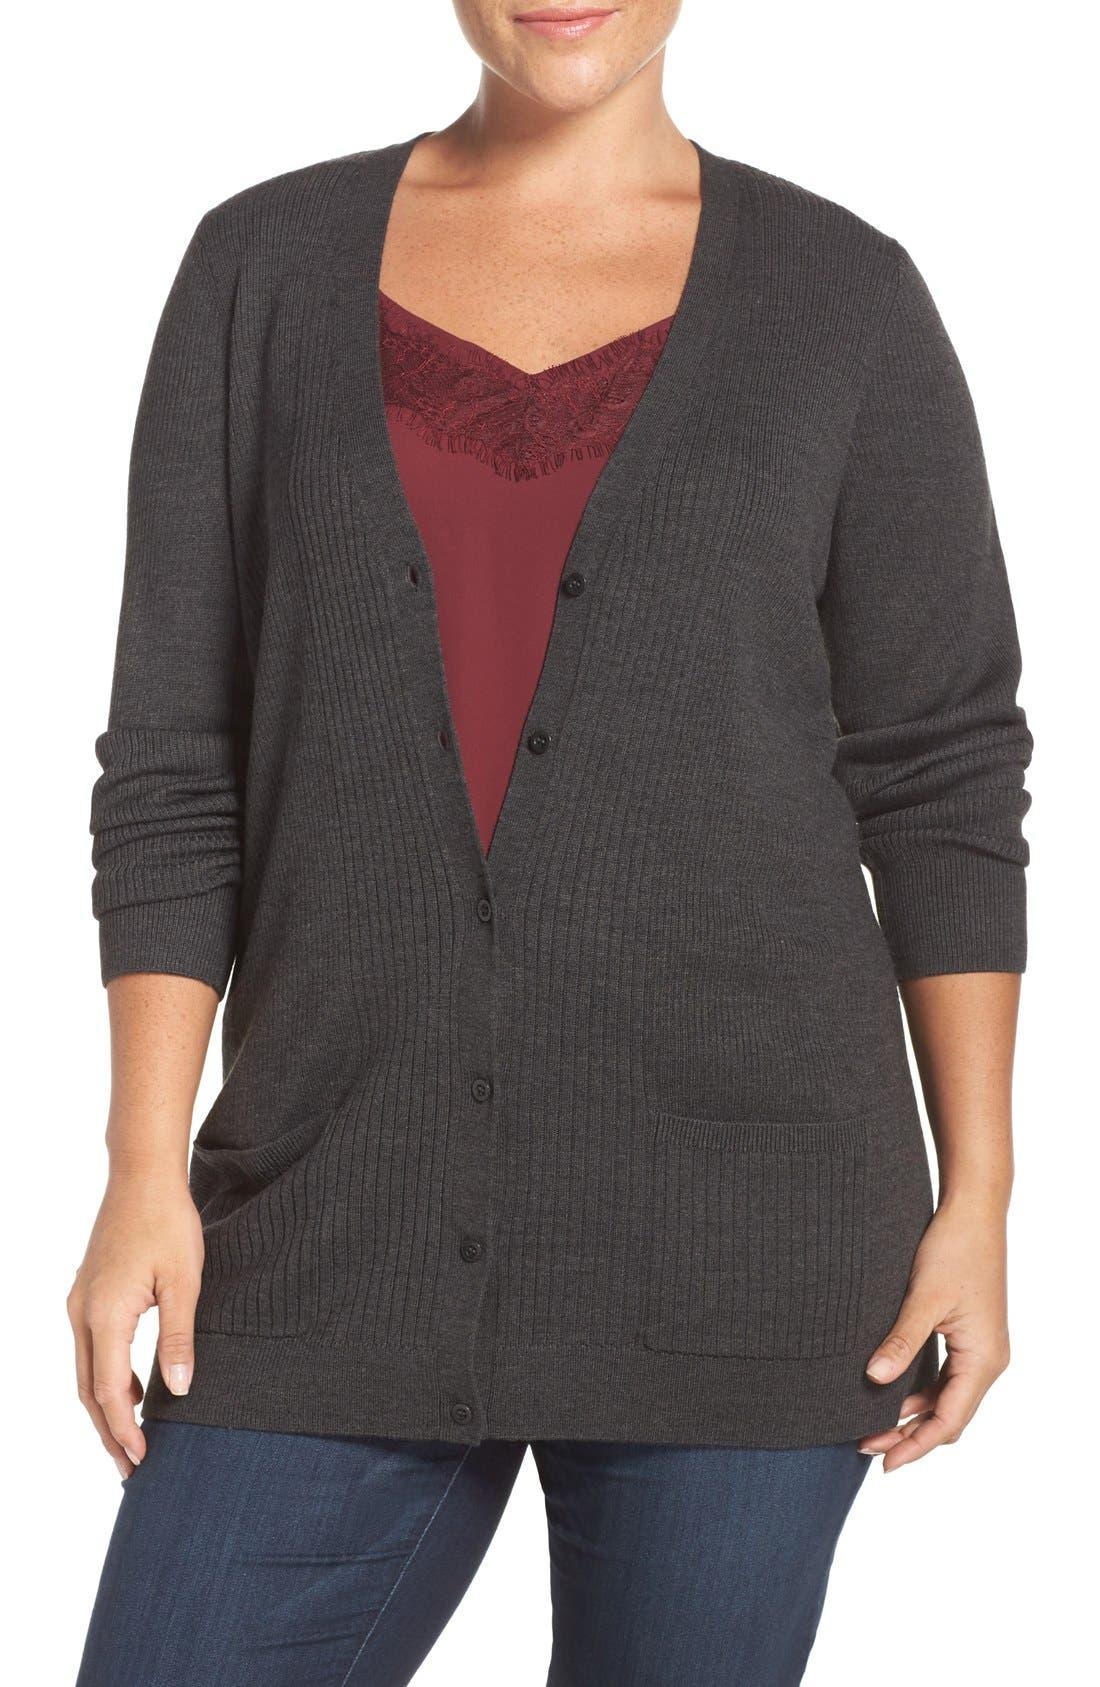 Main Image - Sejour Ribbed V-Neck Cardigan (Plus Size & Petite Plus)